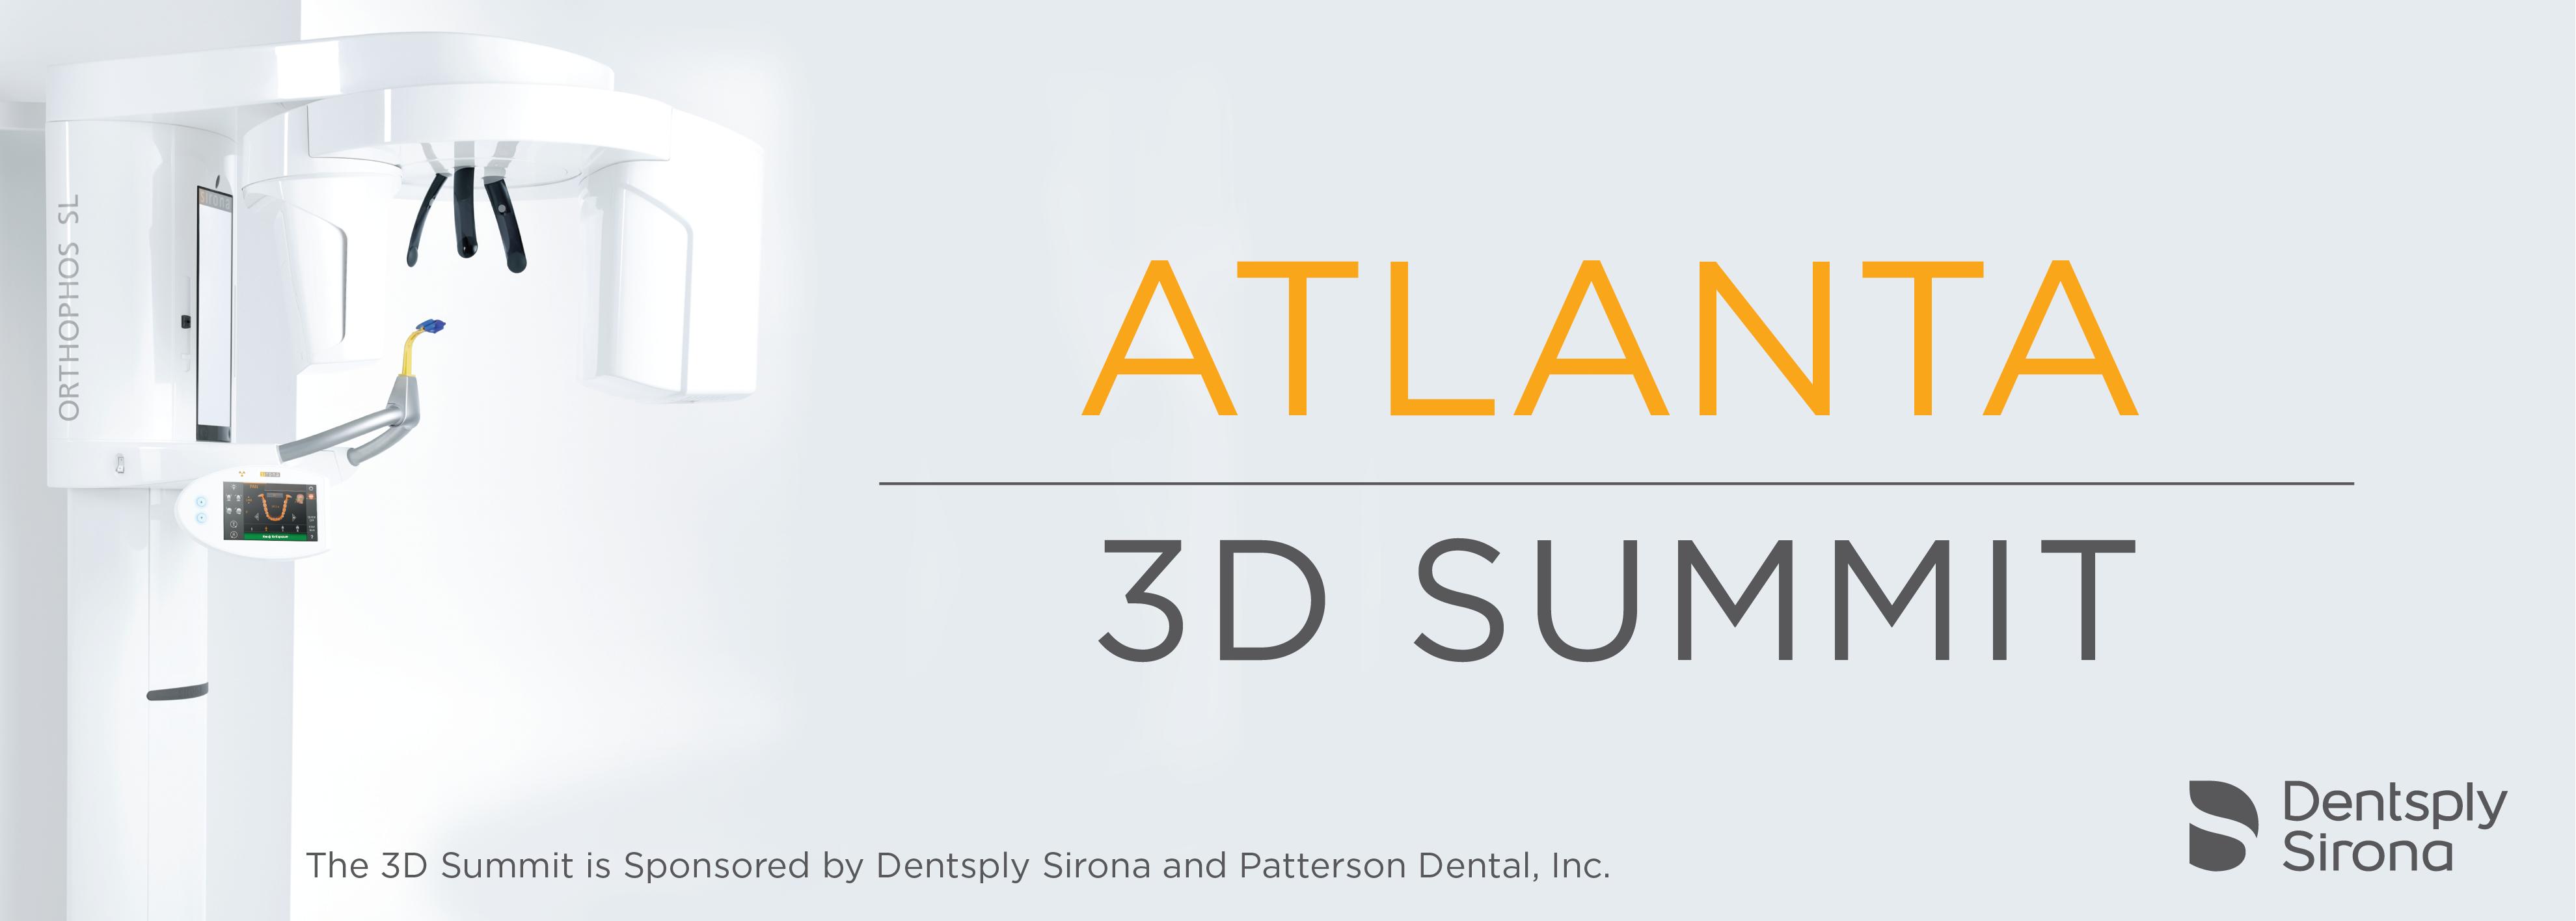 Atlanta 3D Summit